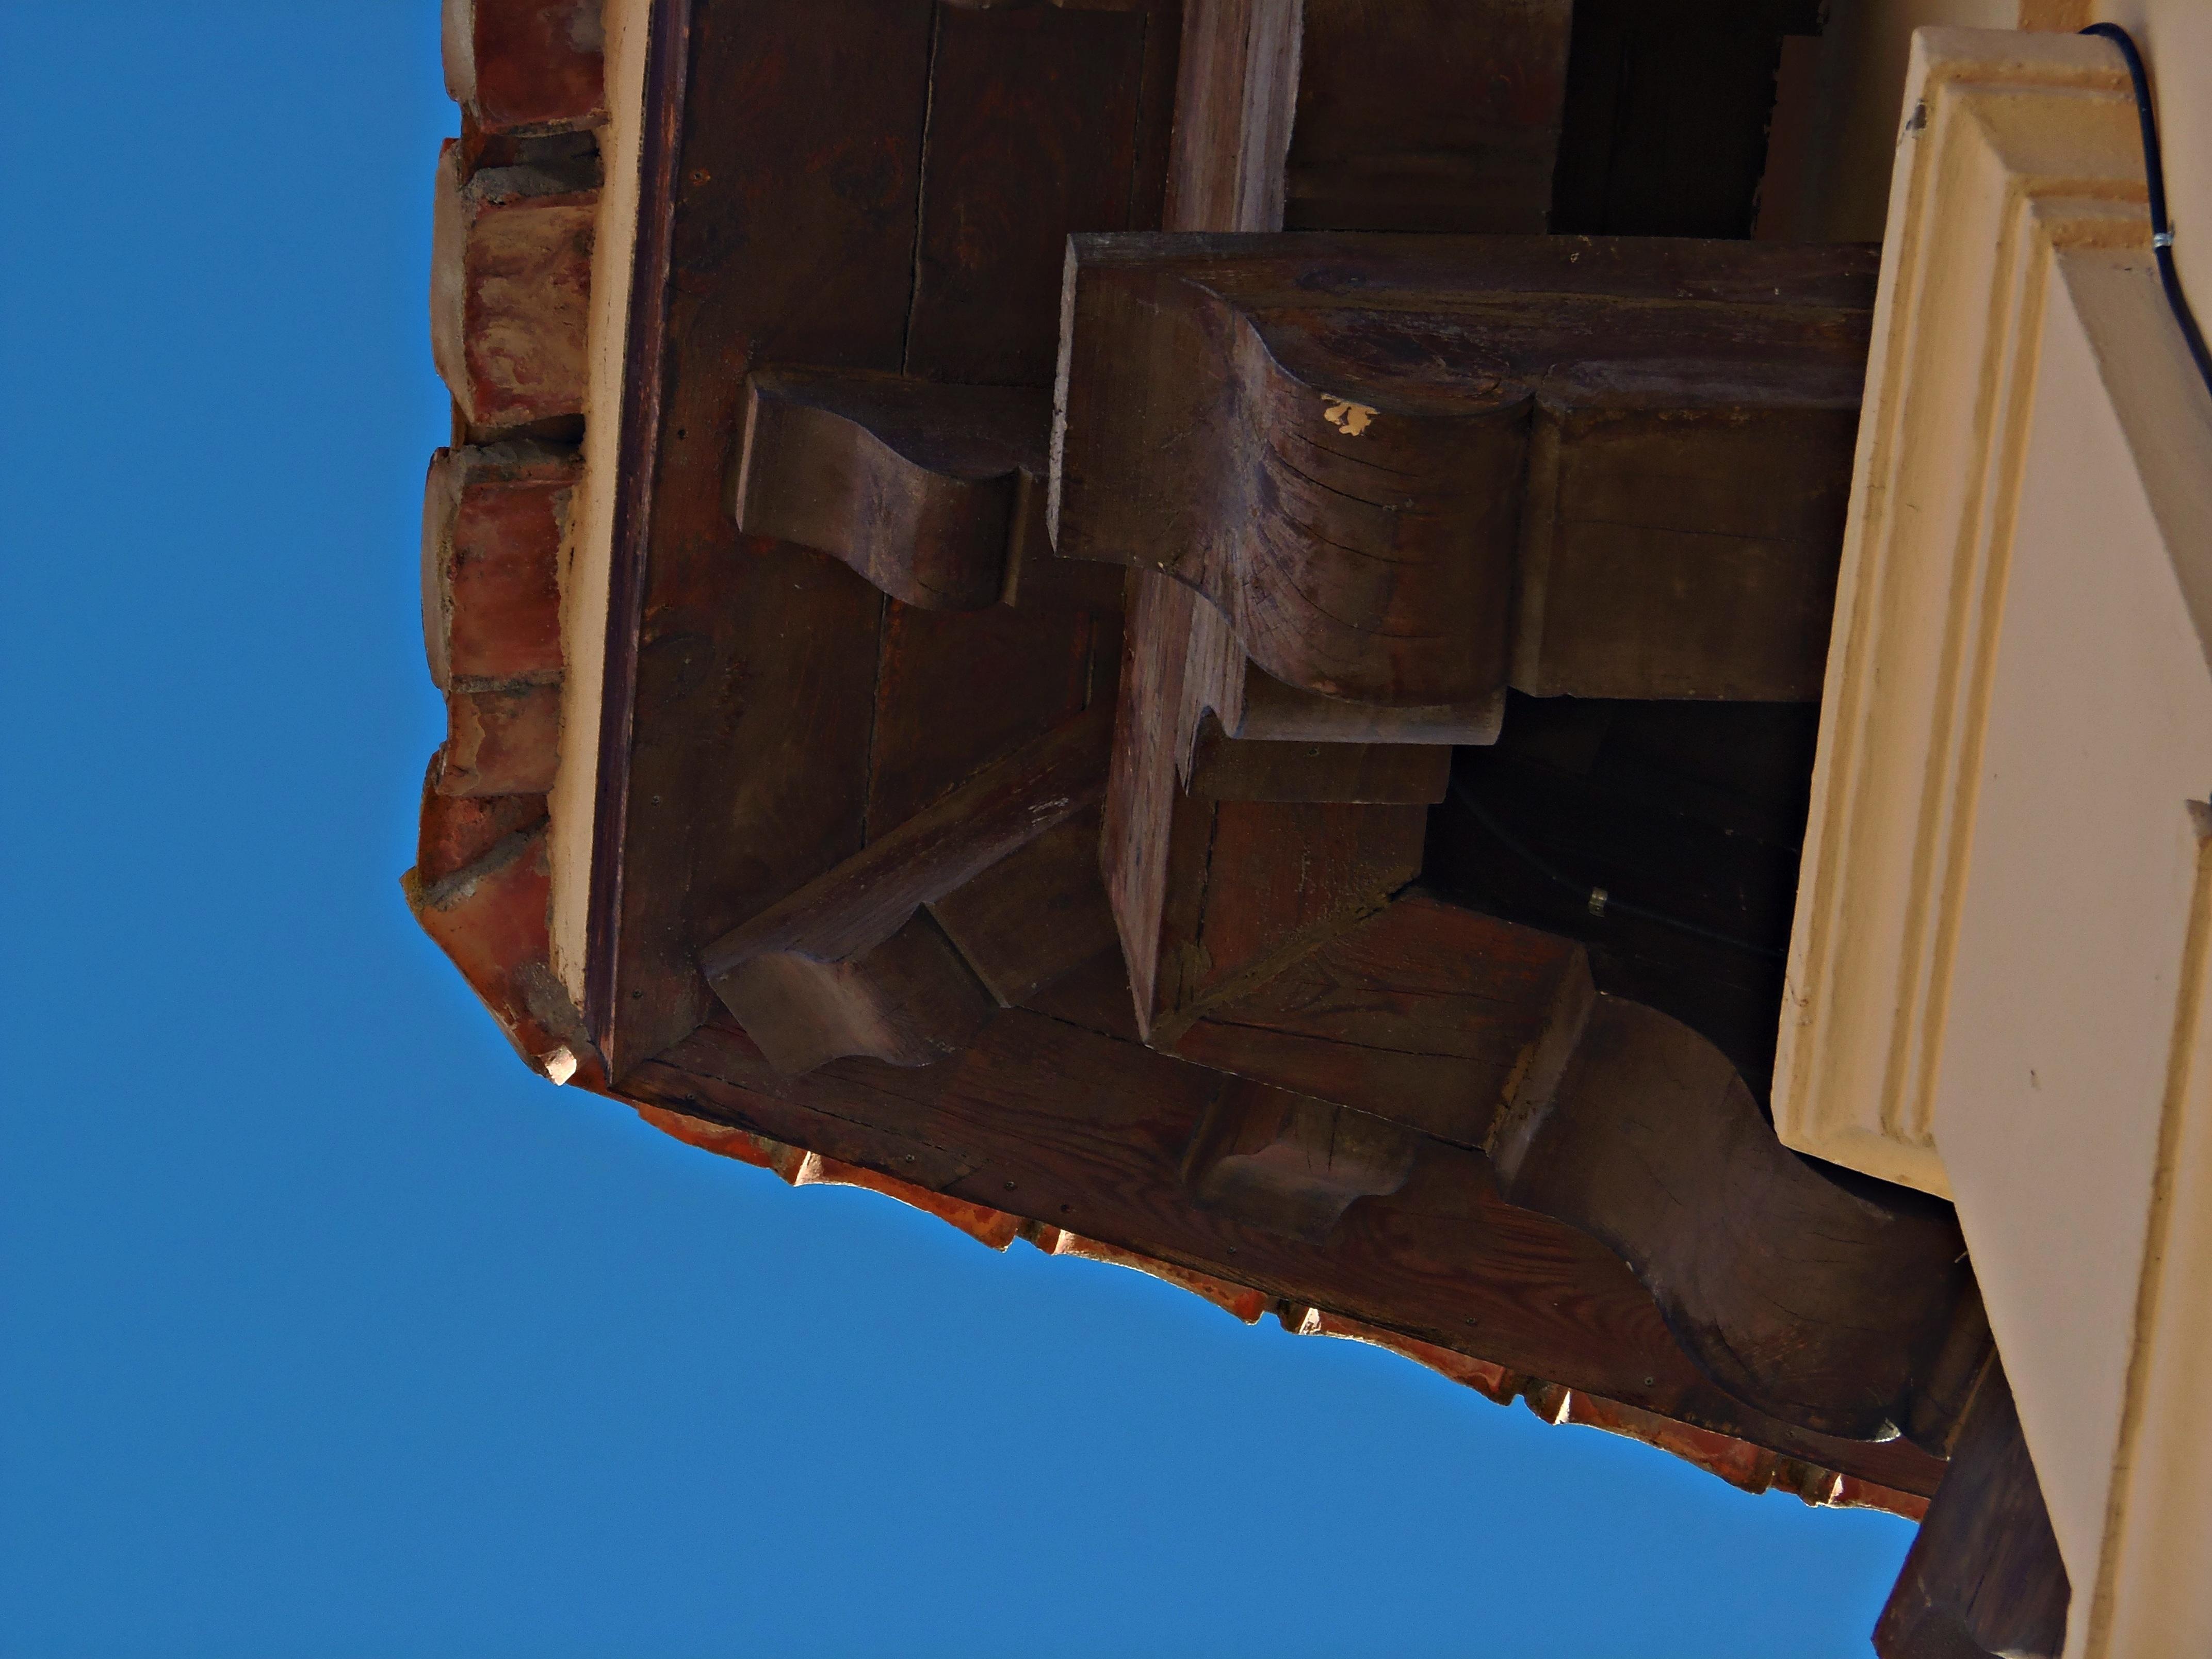 Fotos Gratis Arquitectura Madera Techo Antiguo R Stico Azul  # Muebles Mudejar